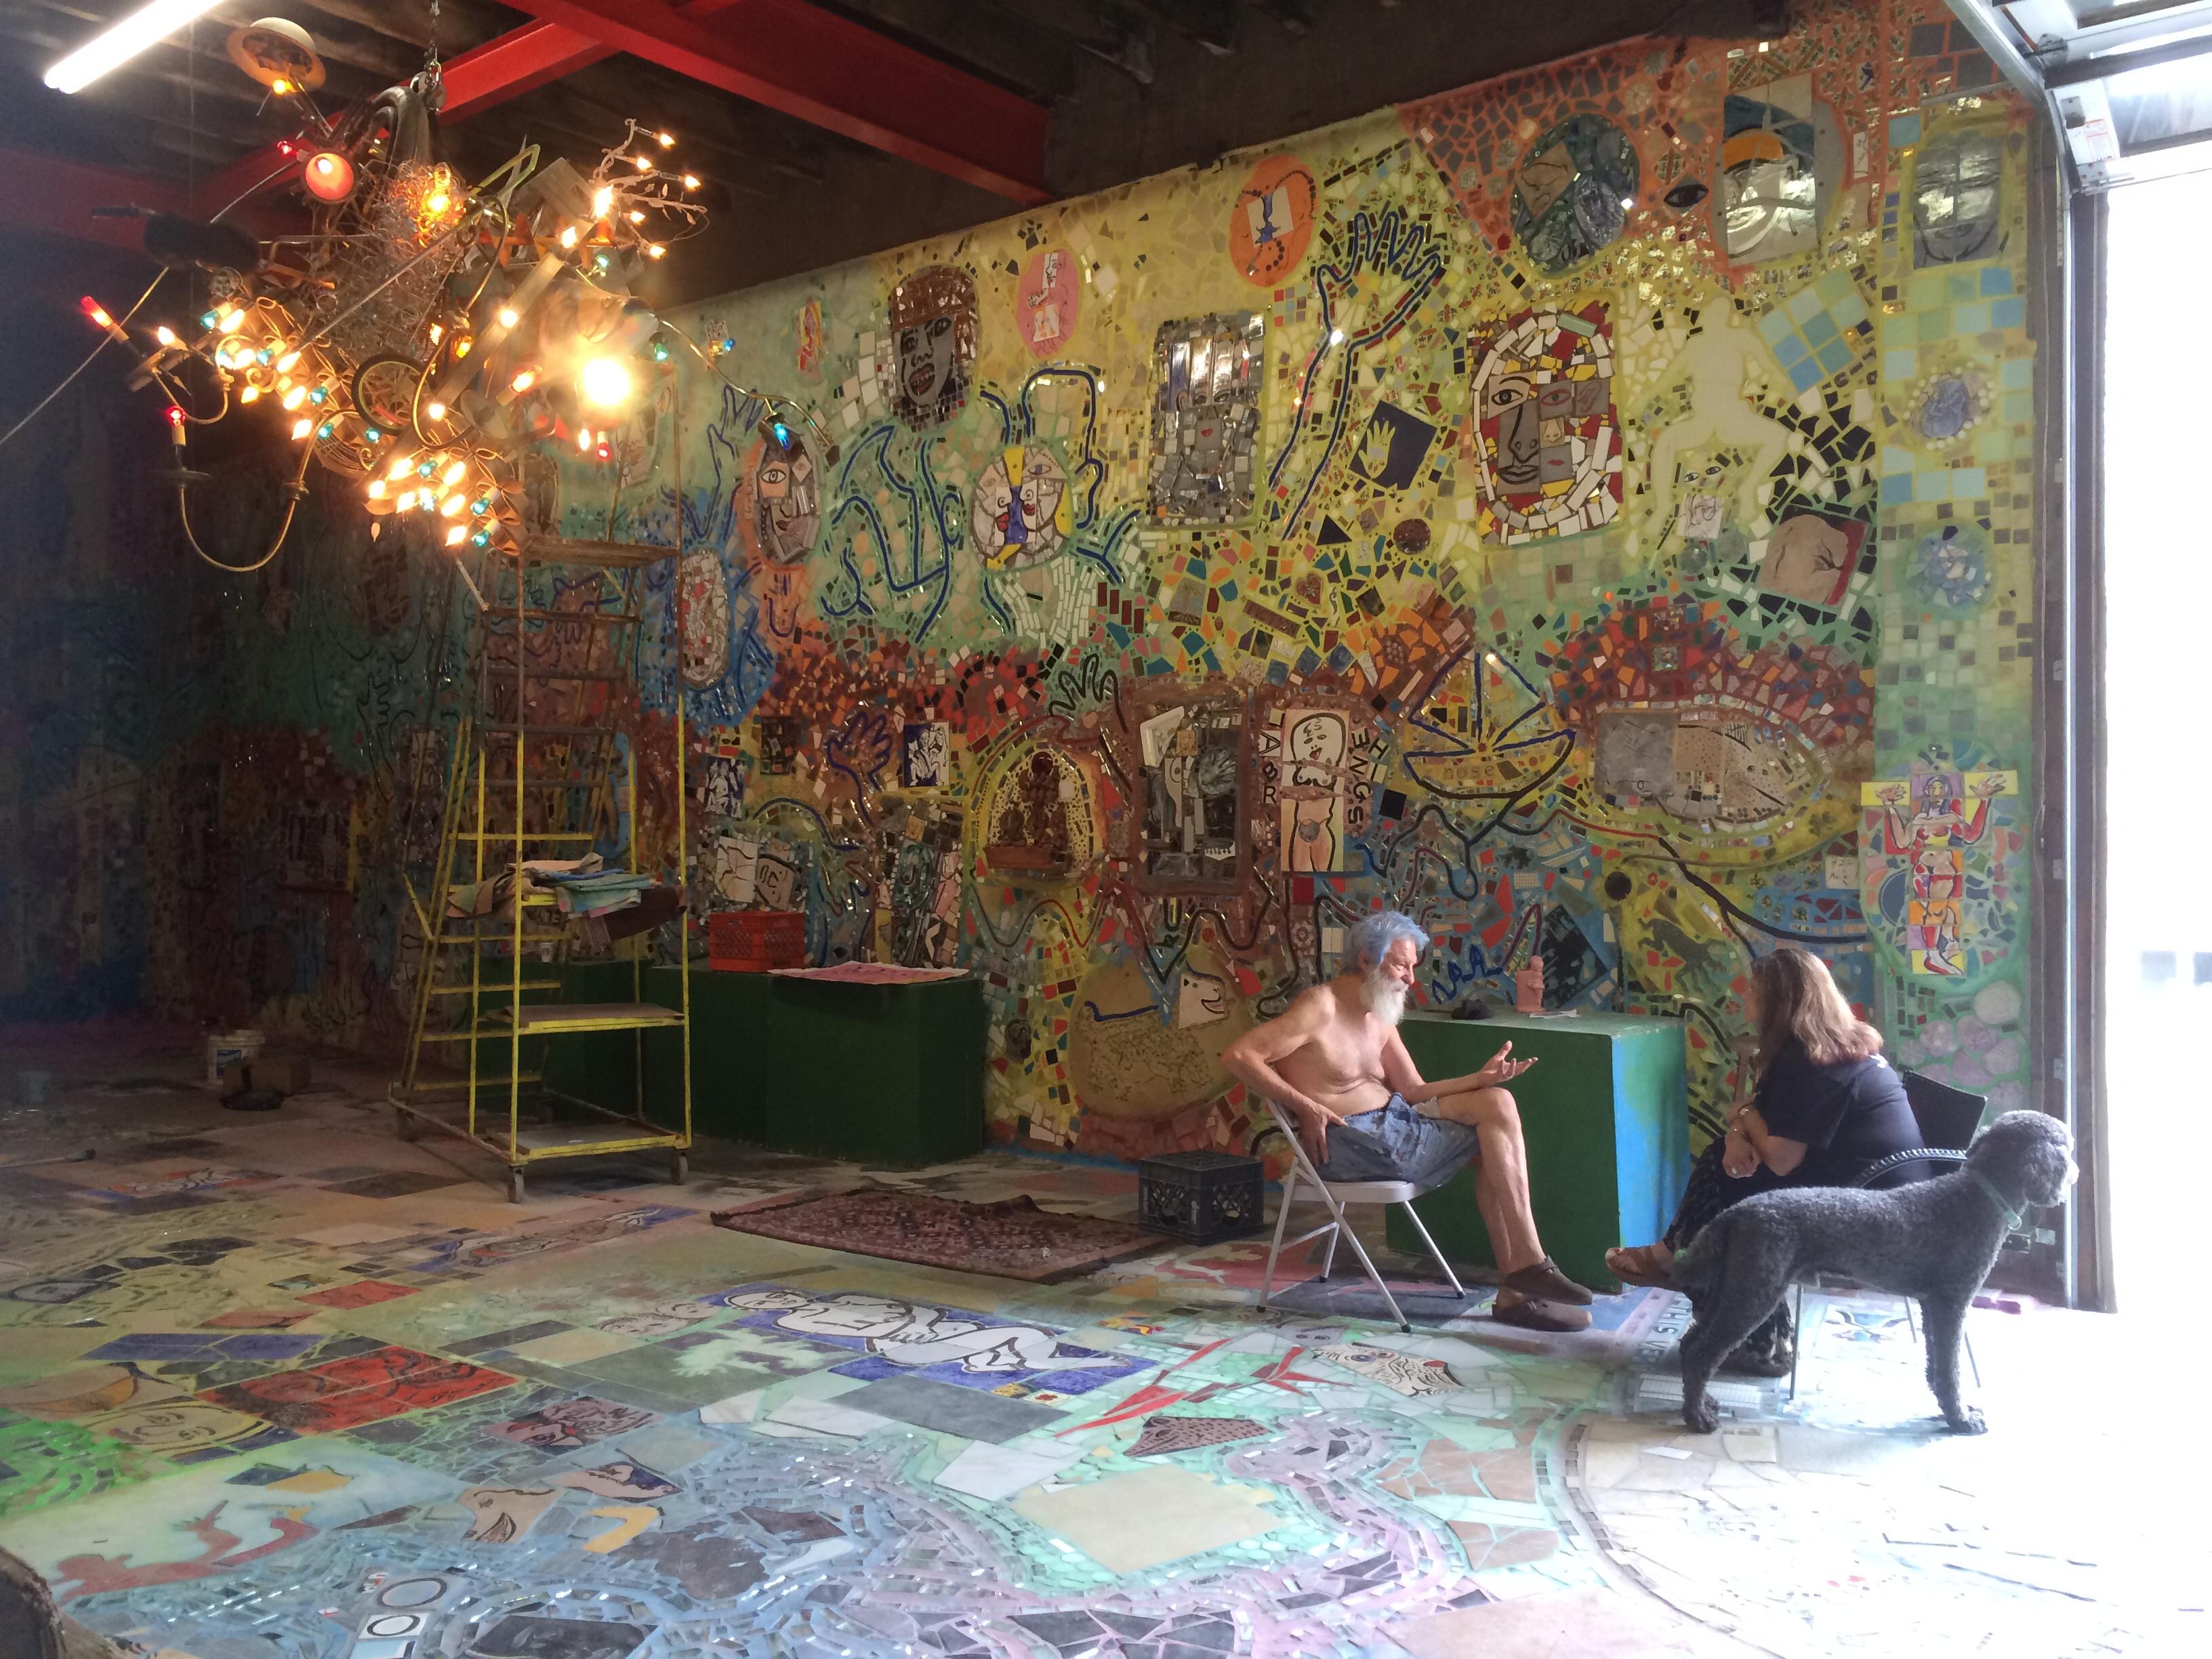 Isaiah Zagar, master artist, Michele Saffier, LMFT, CSAT-S